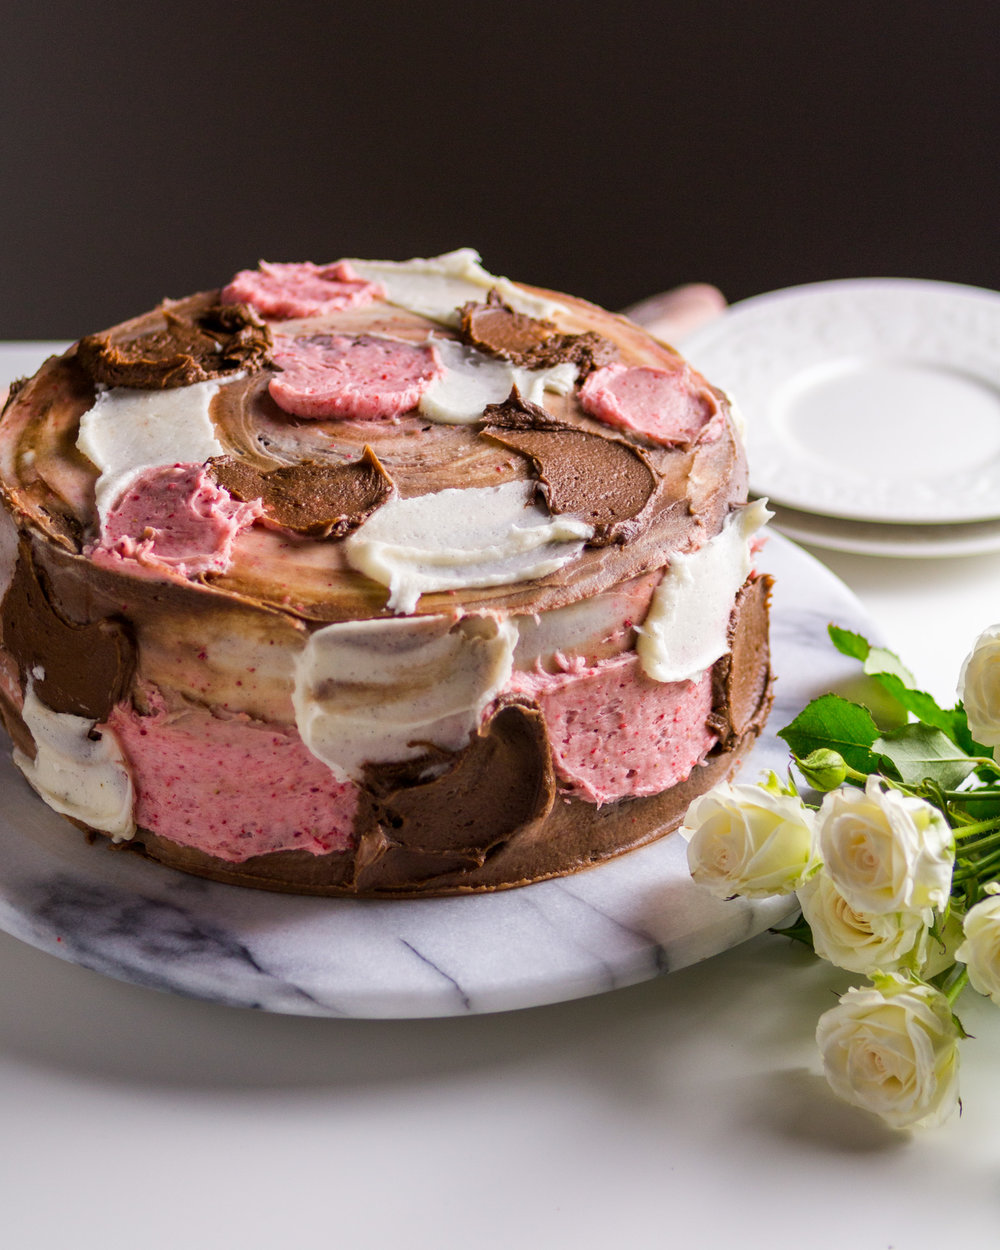 neapolitan-checkered-cake-4.jpg